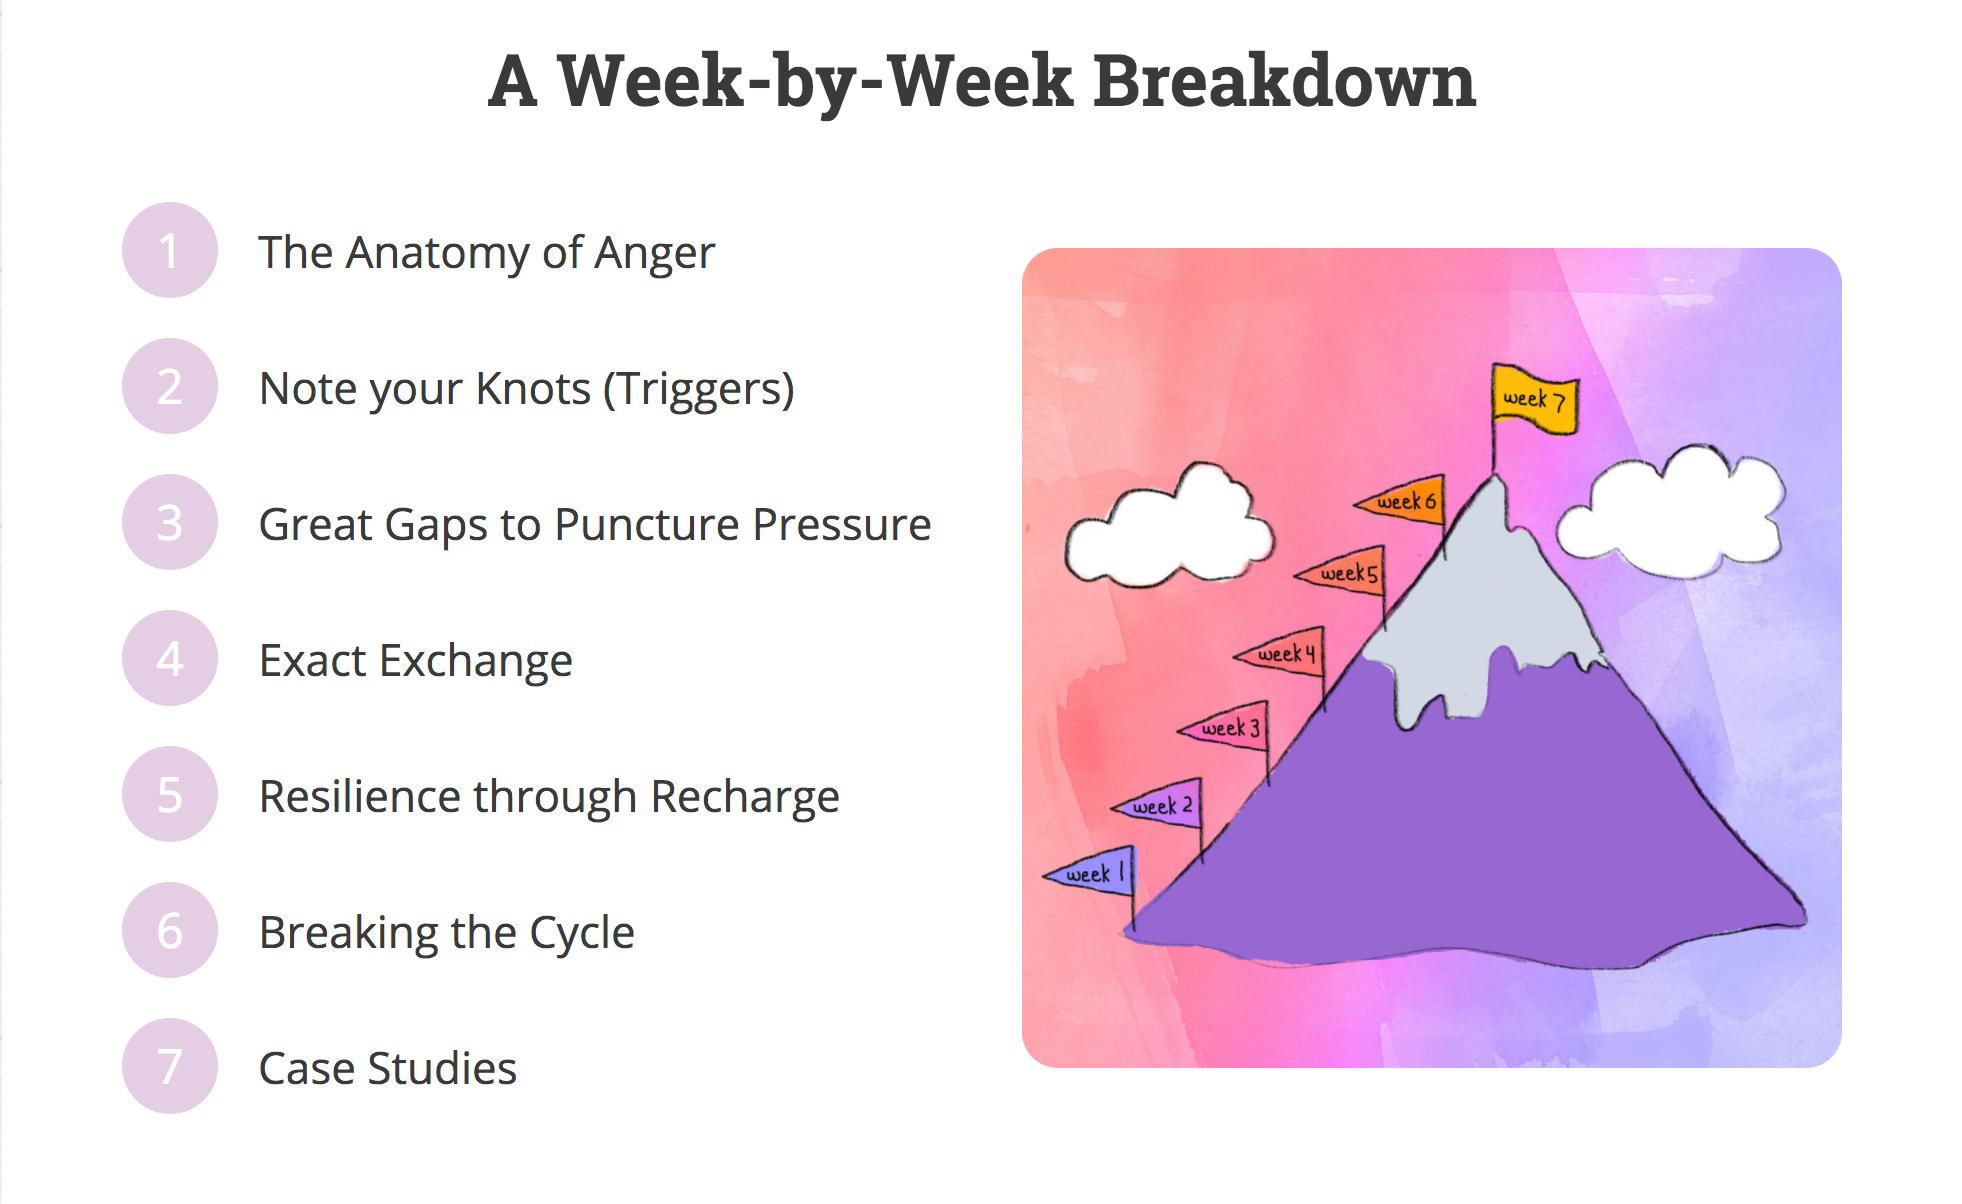 A Week by Week Breakdown